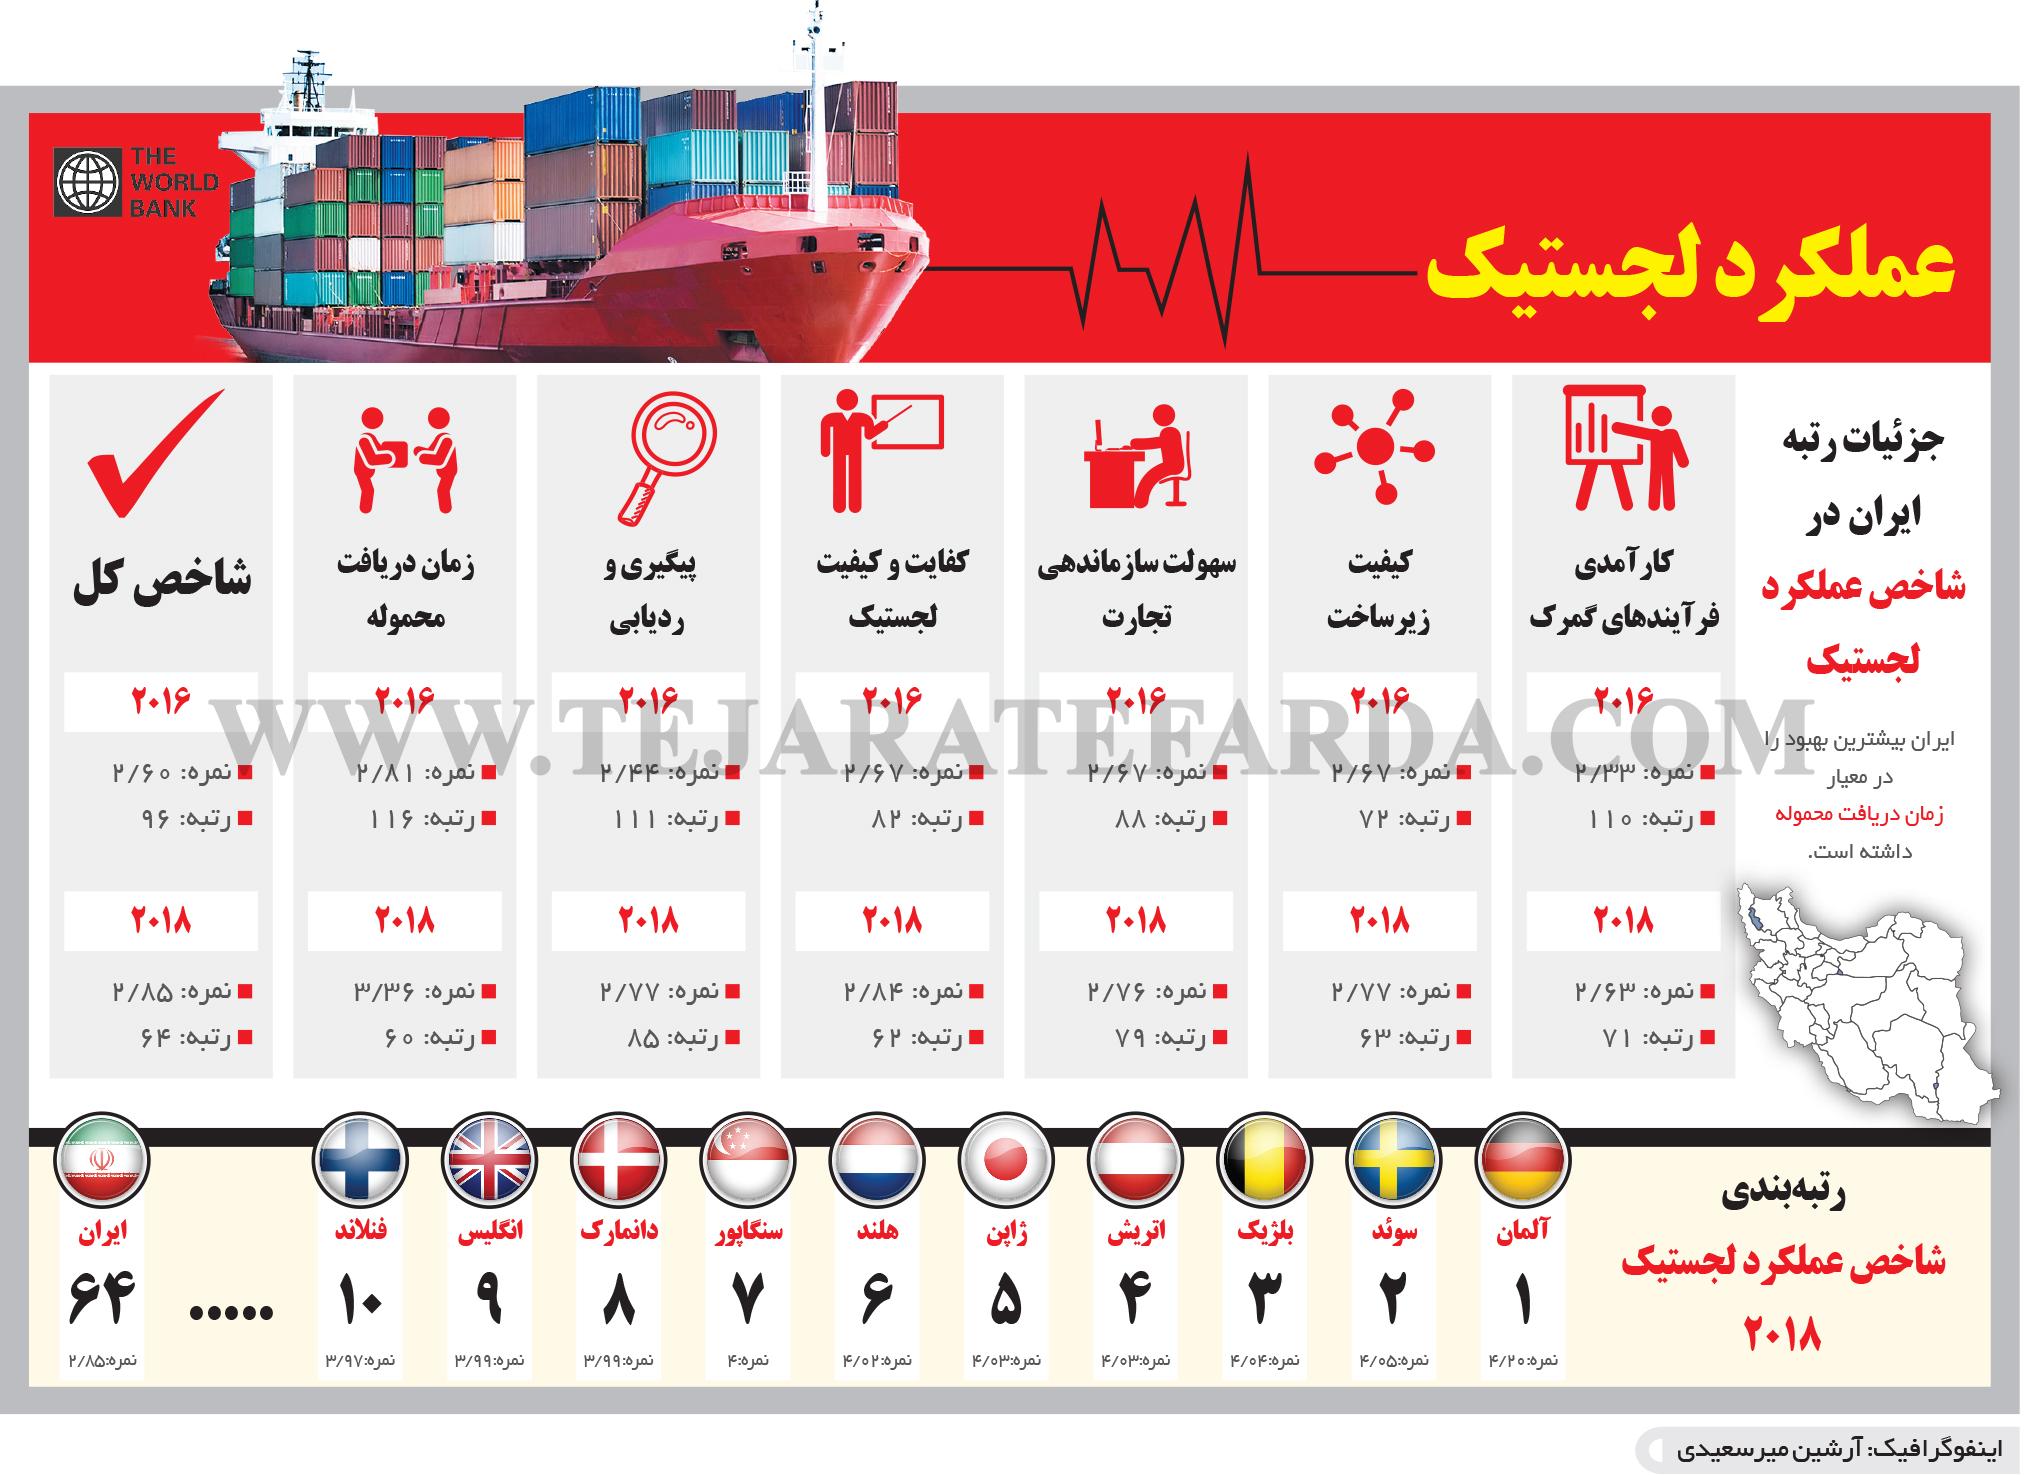 تجارت- فردا- عملکرد لجستیک(اینفوگرافیک)